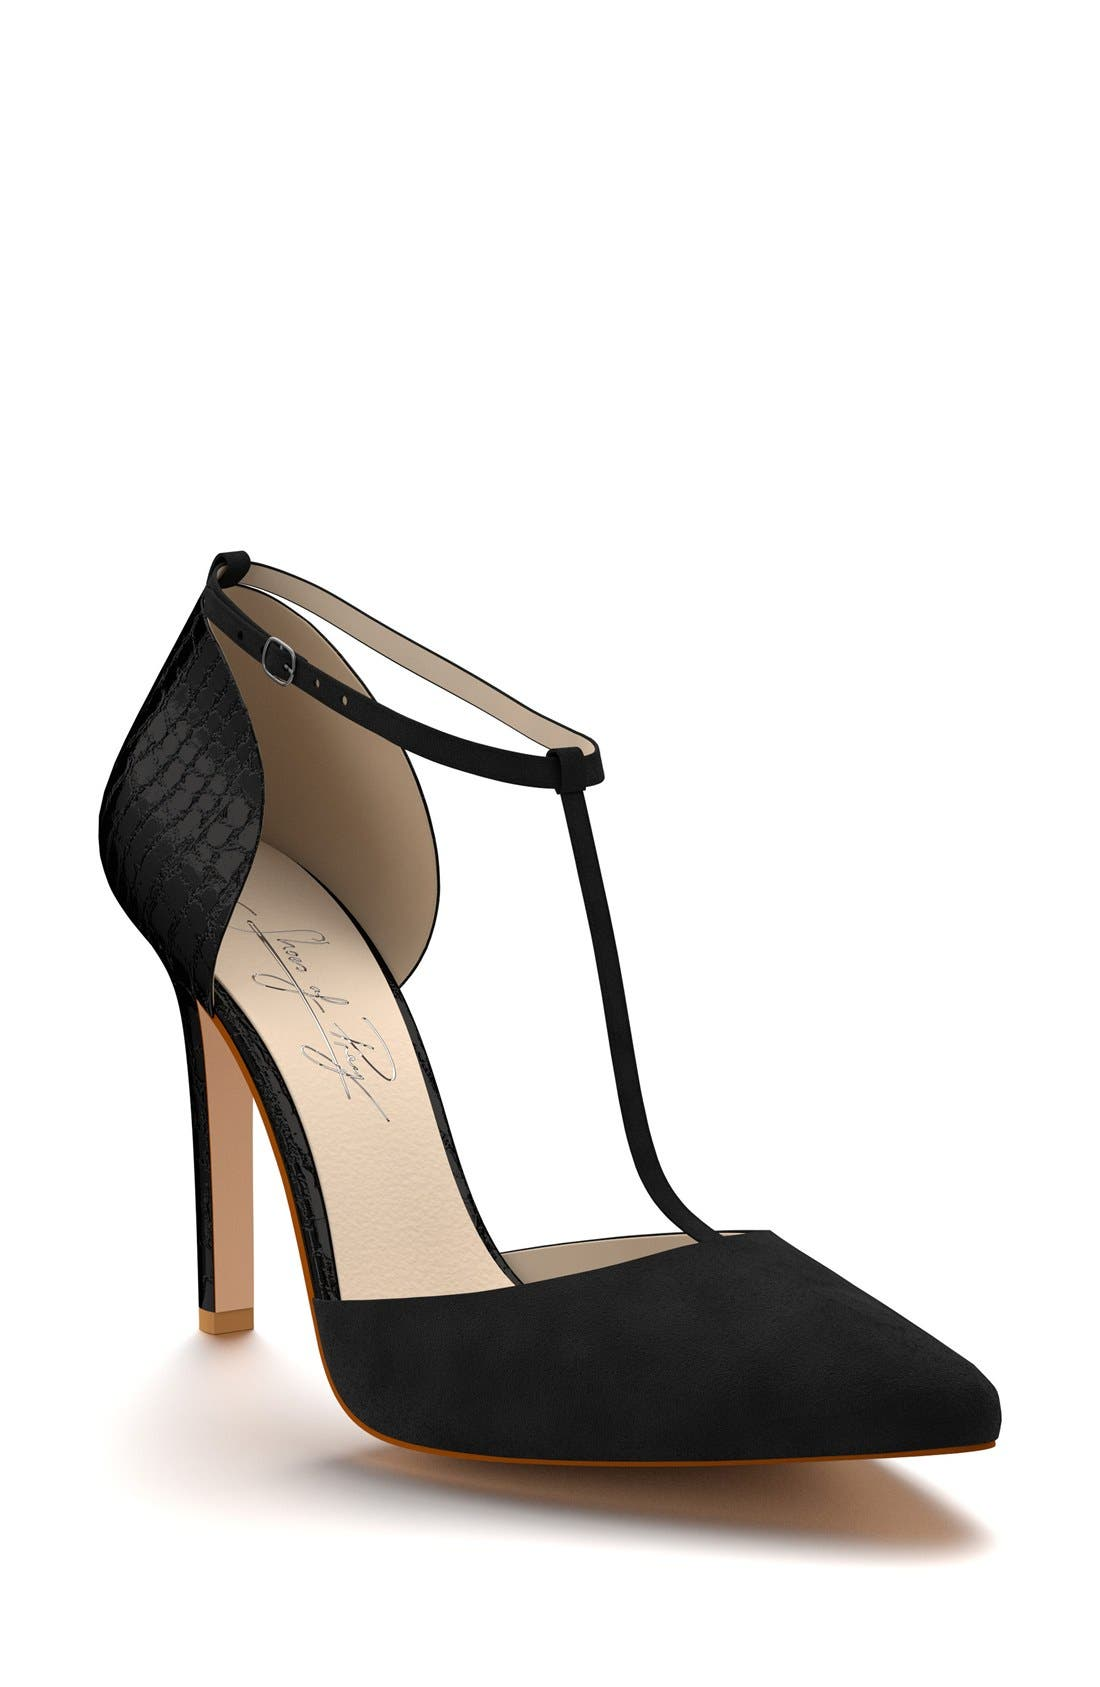 Shoes of Prey d'Orsay T-Strap Pump (Women)